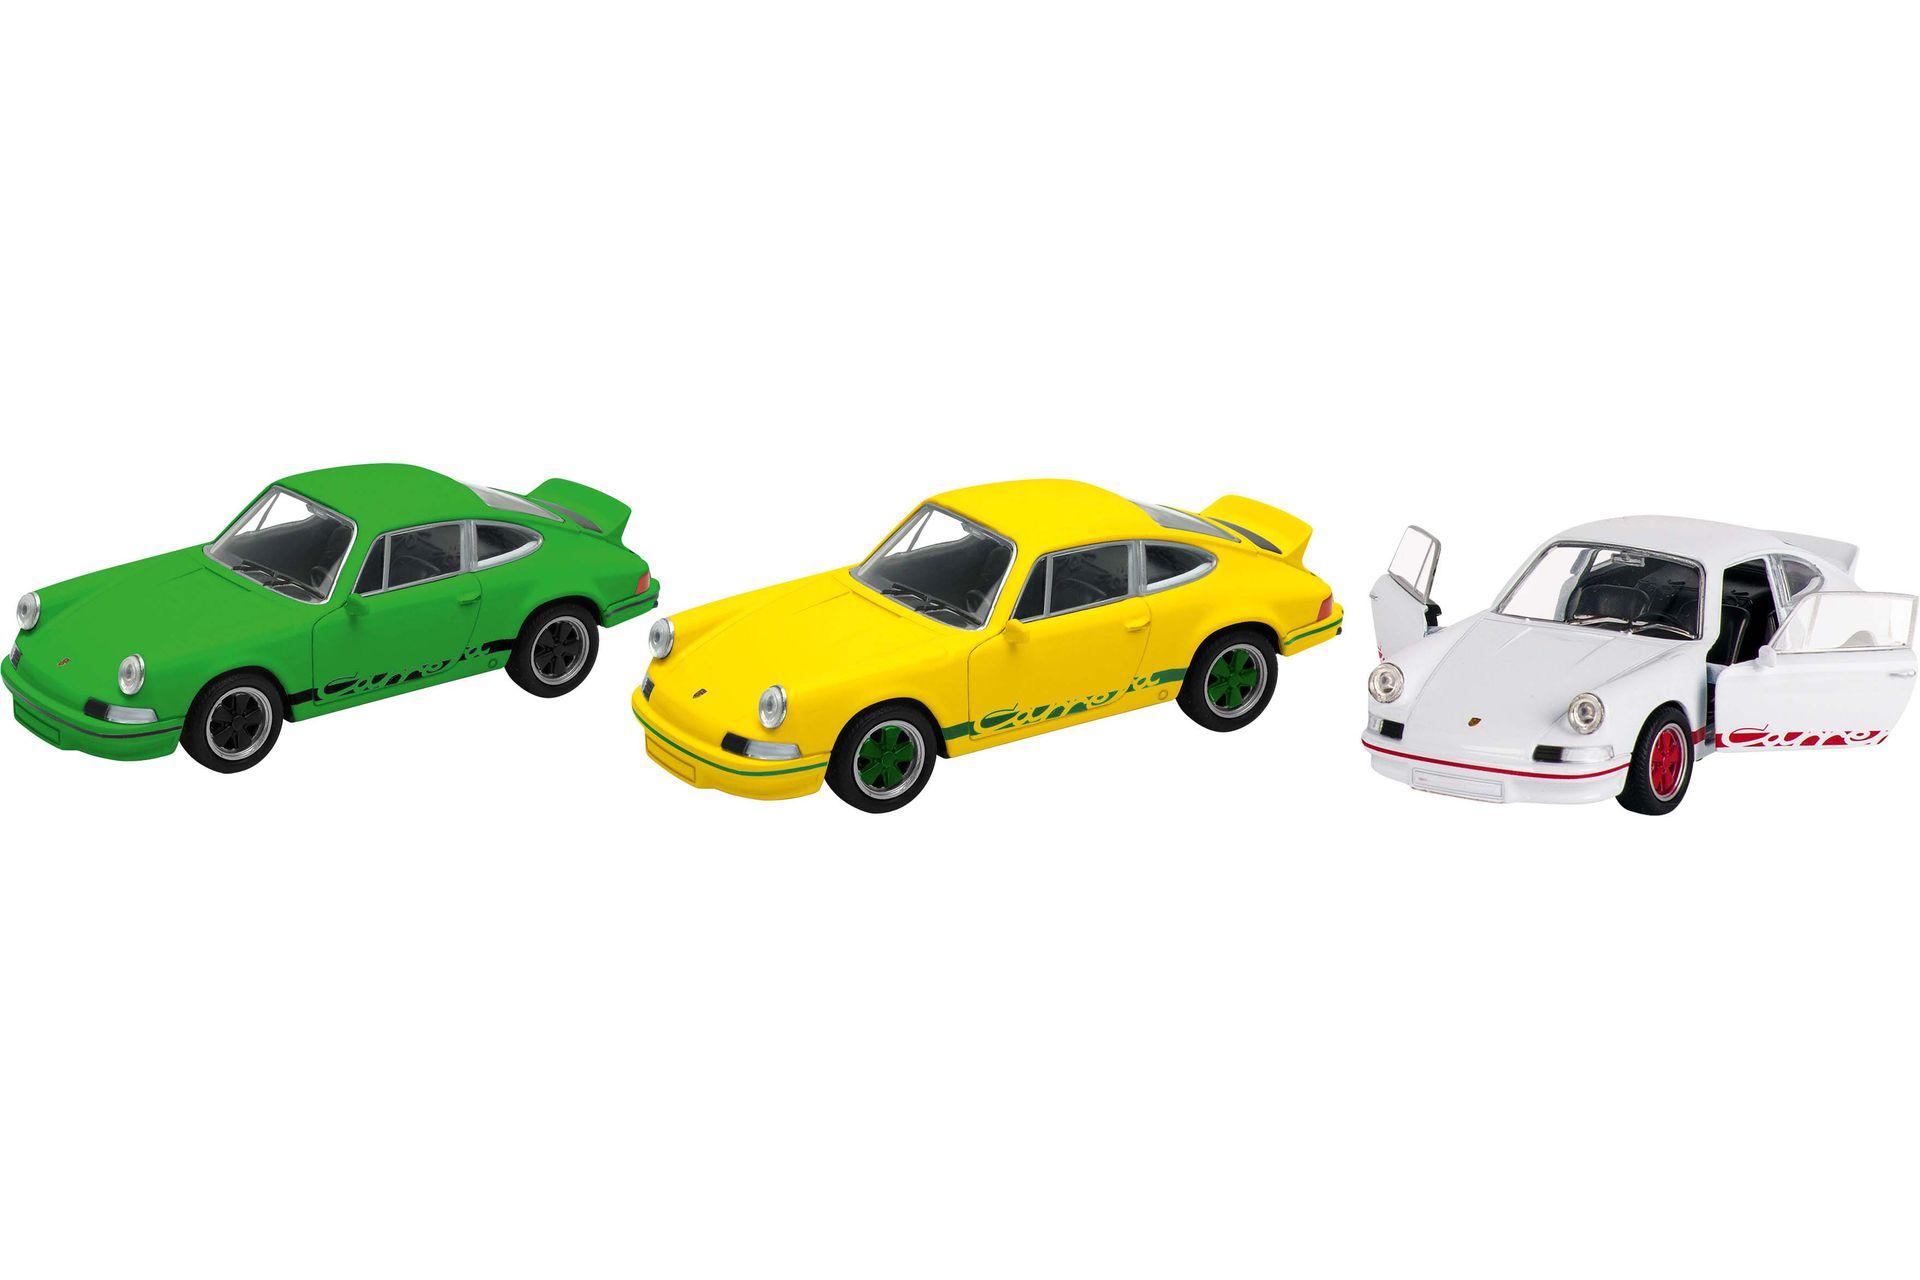 Jucarie - Masinuta Porsche - mai multe modele | Goki